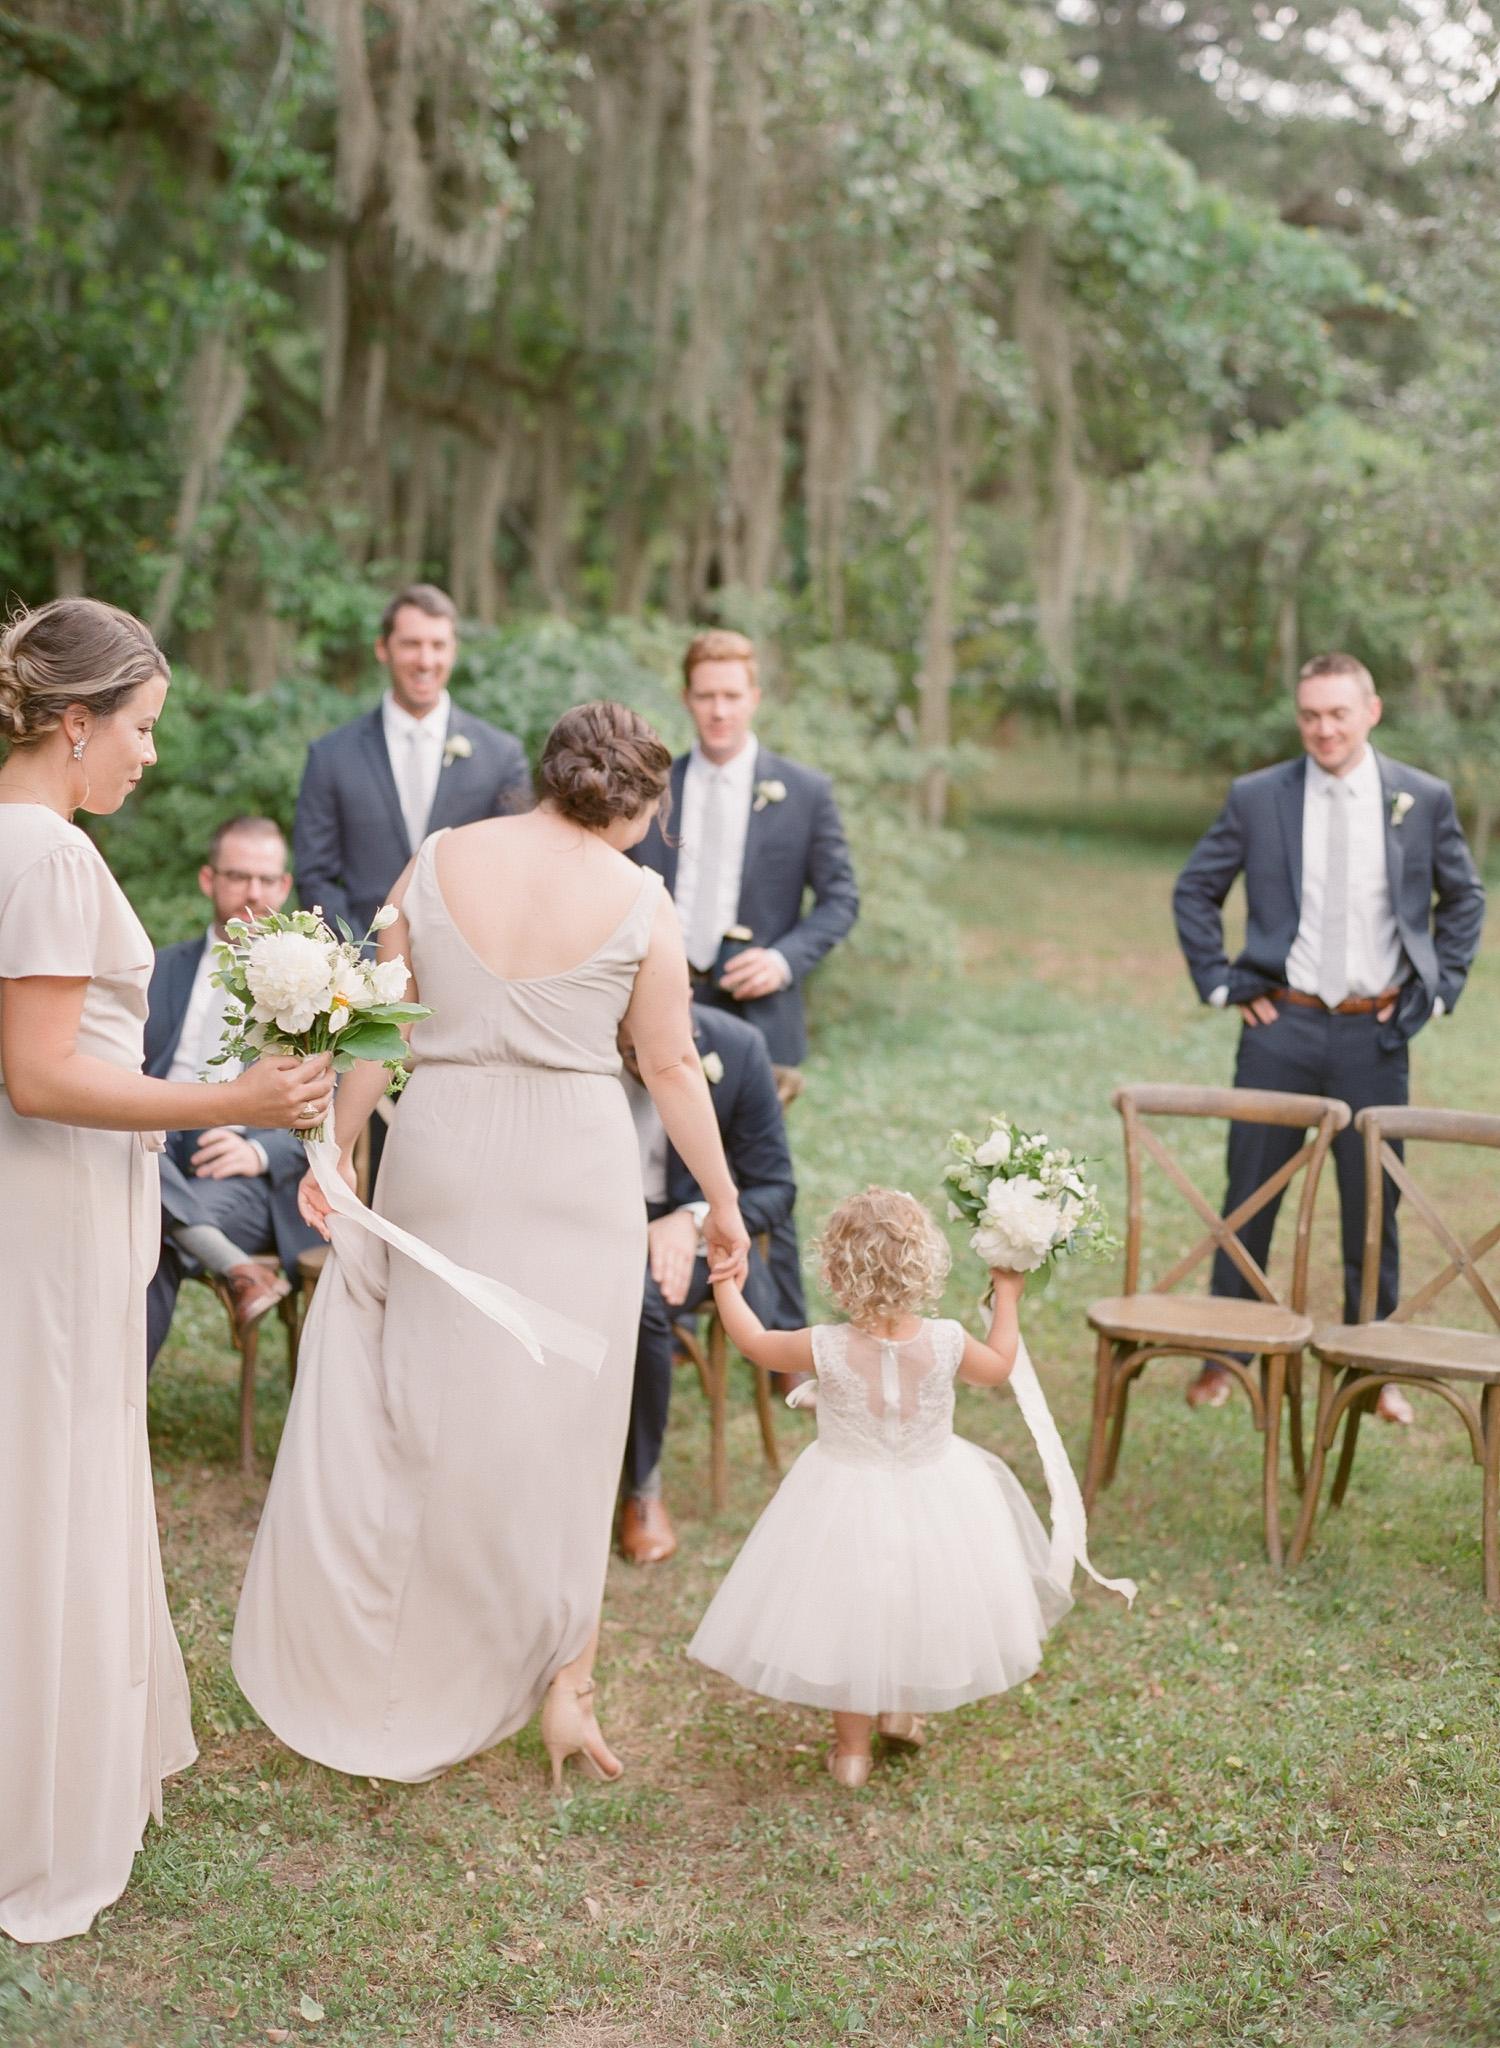 Charleston-Legare-Waring-Photographer-38.jpg